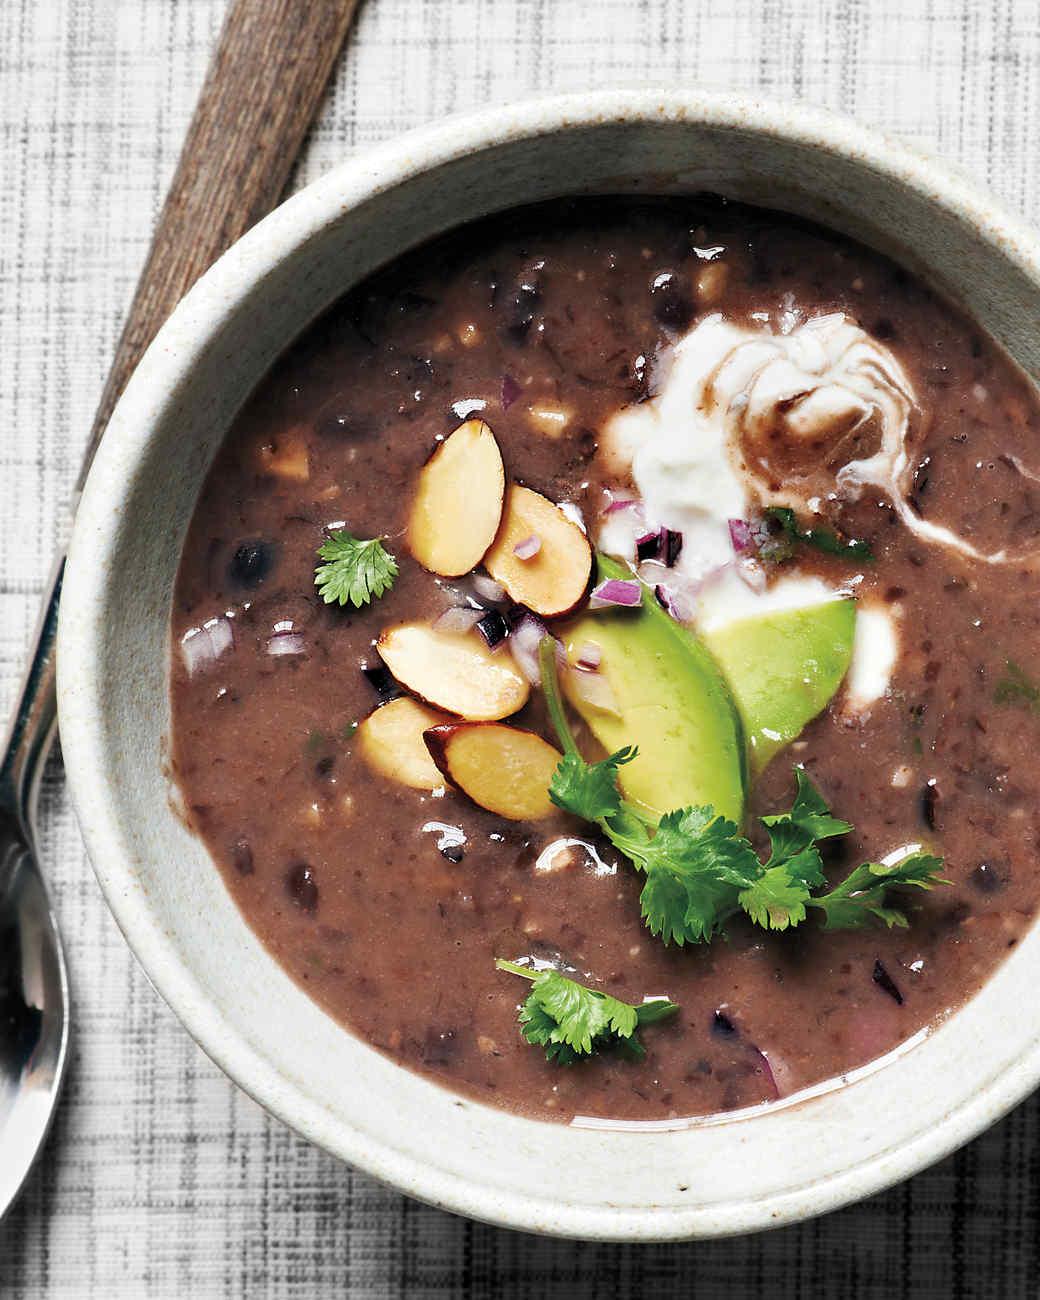 black-bean-soup-7706-md110461.jpg